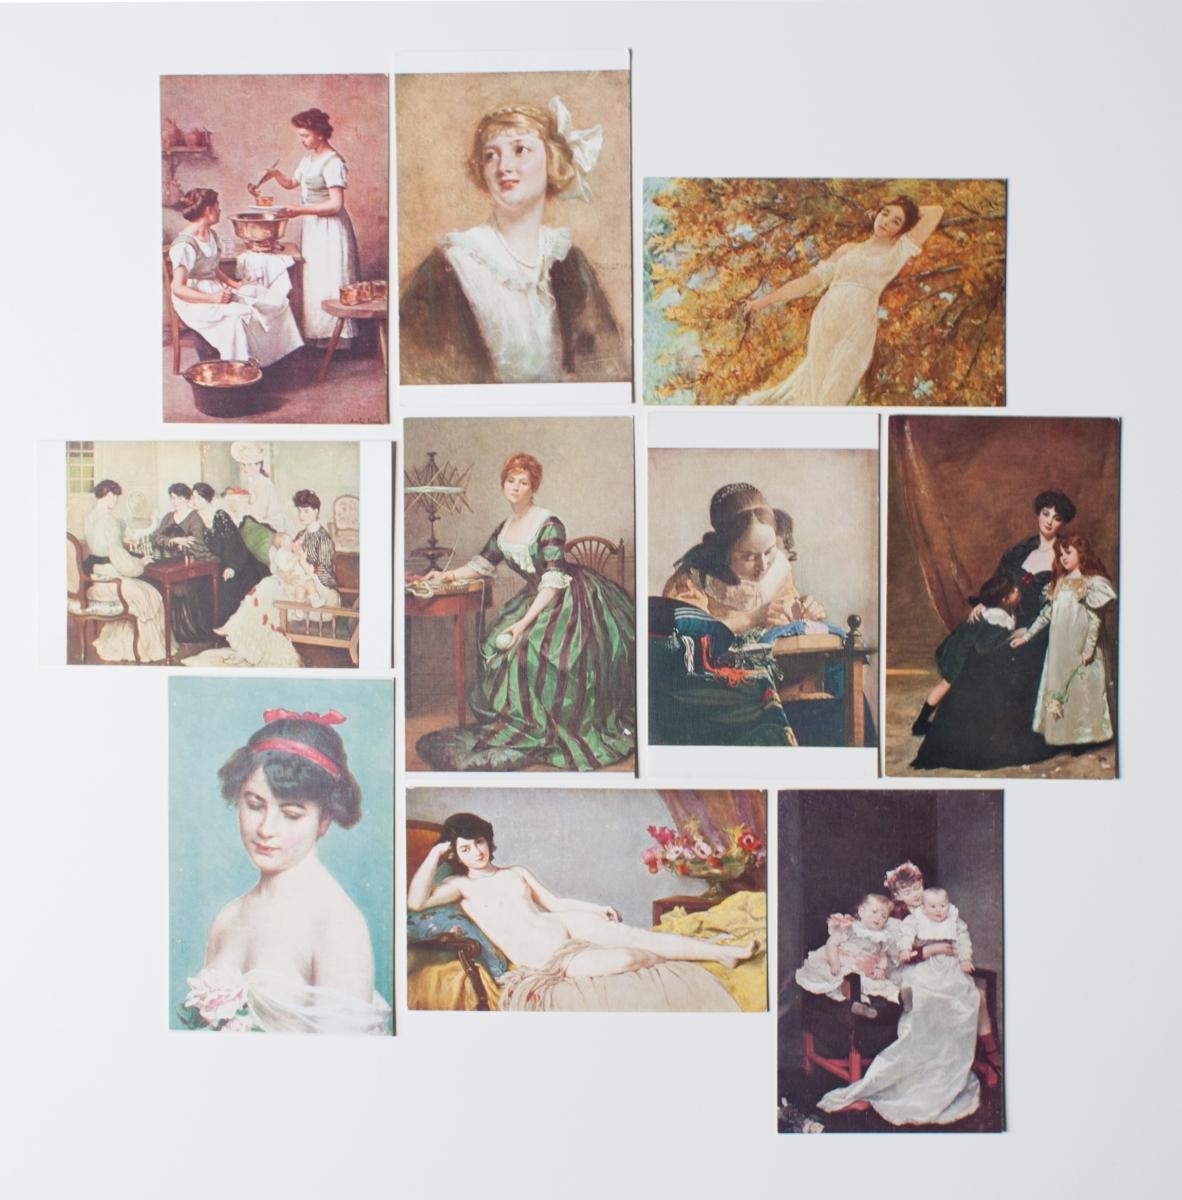 lot de cartes postales de collection - Luckyfind